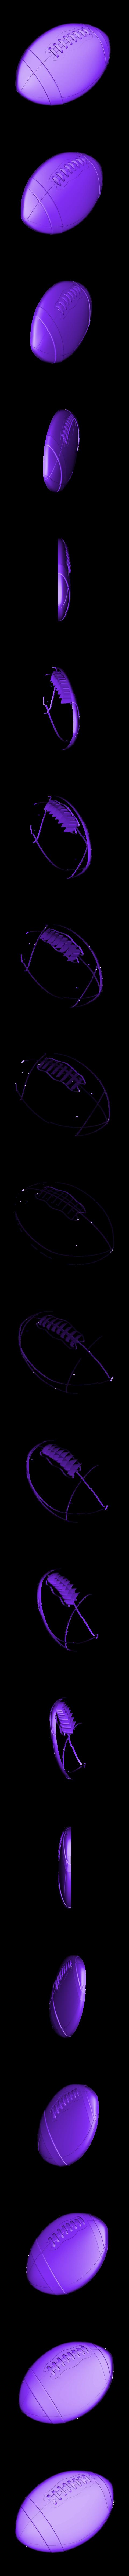 P105c.STL Download STL file Set American Football • 3D printable model, 3dmodelsByVadim